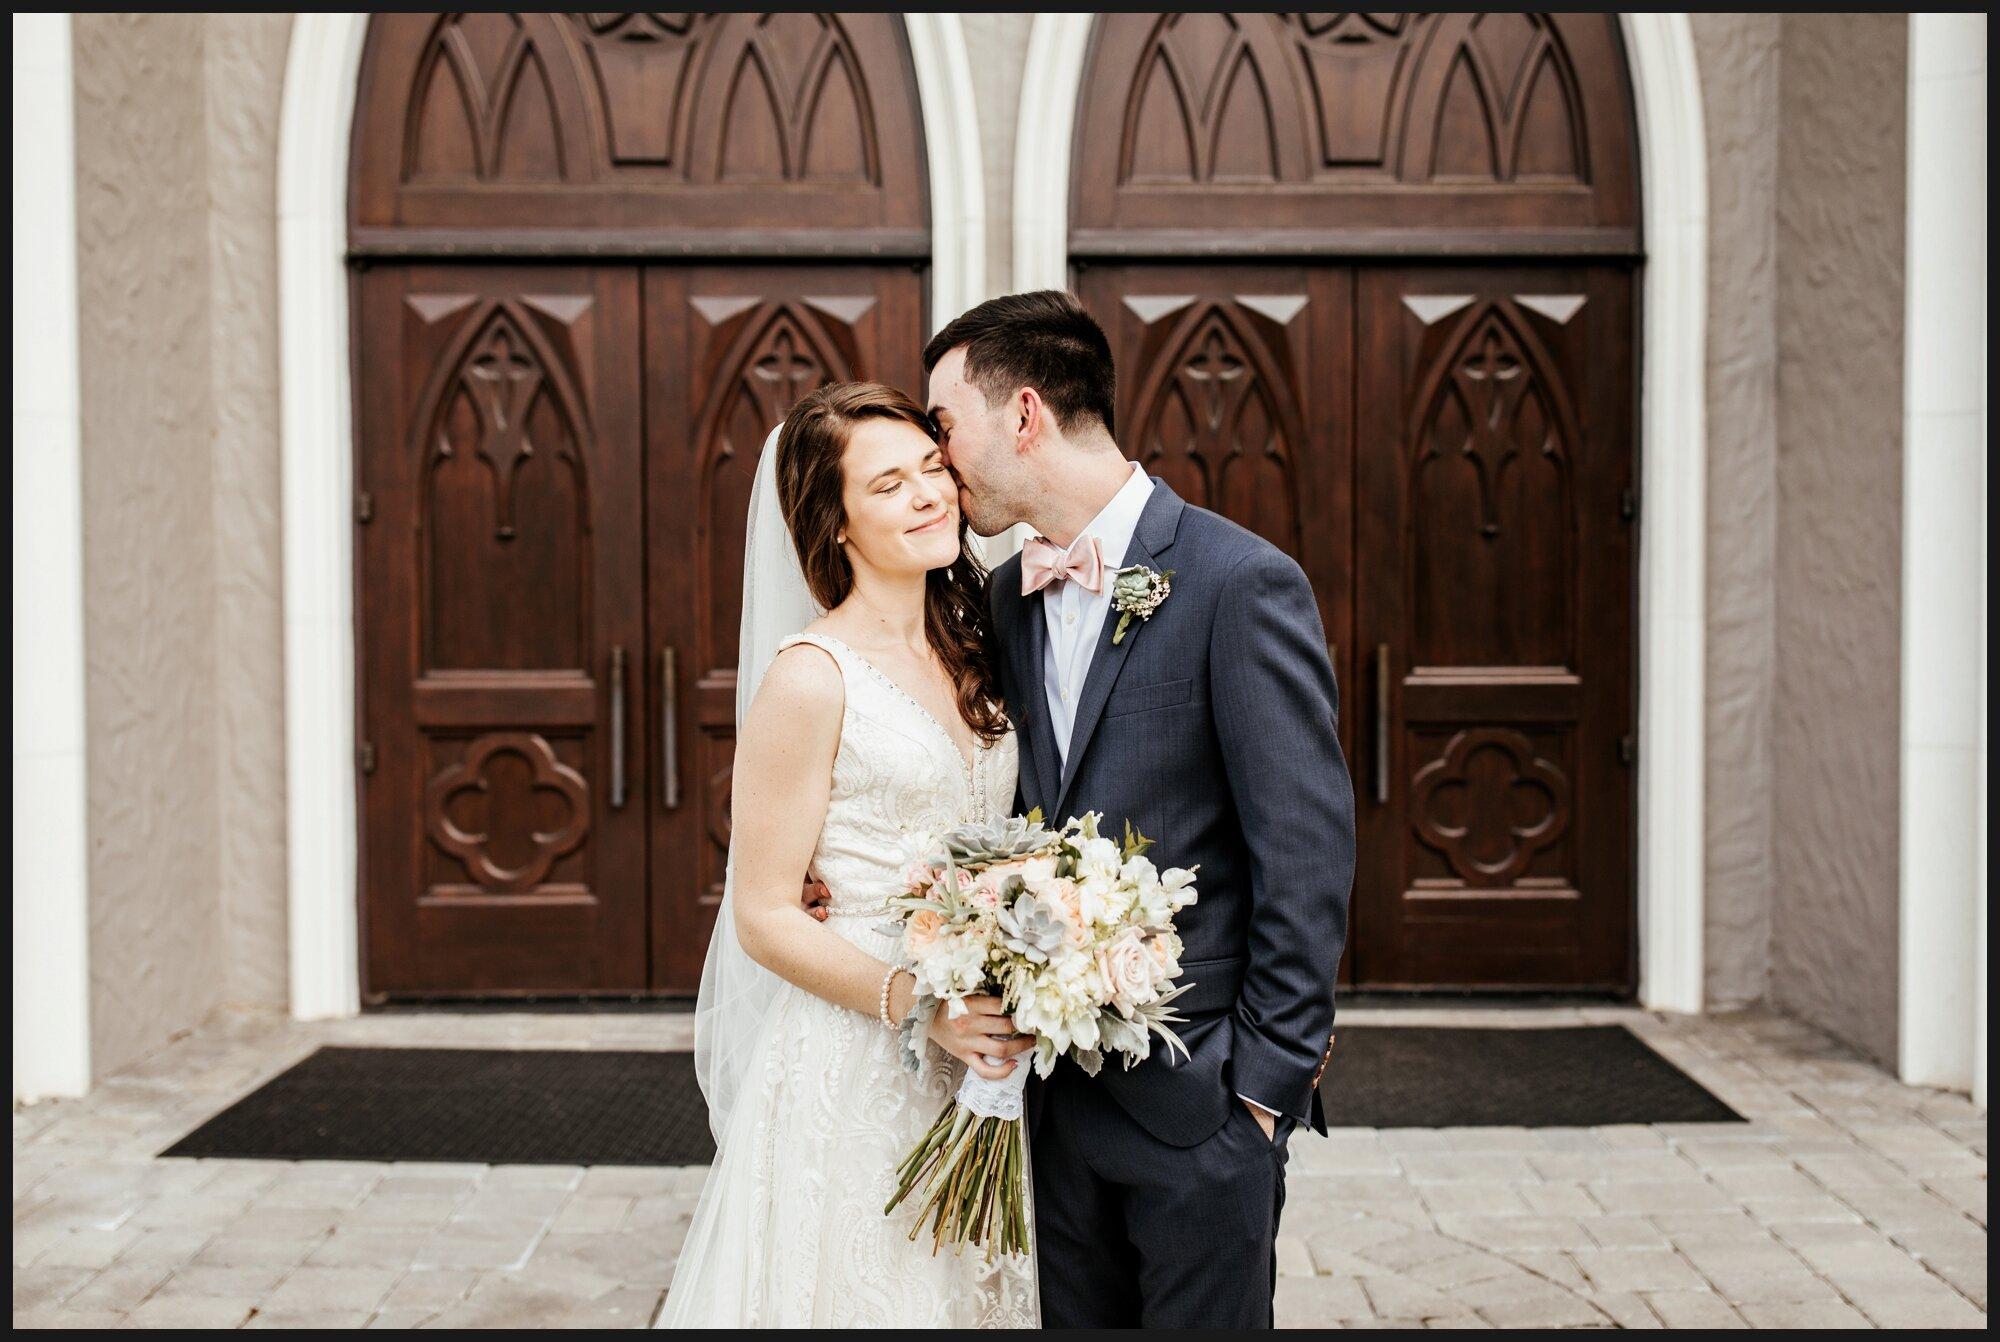 Orlando-Wedding-Photographer-destination-wedding-photographer-florida-wedding-photographer-hawaii-wedding-photographer_0672.jpg